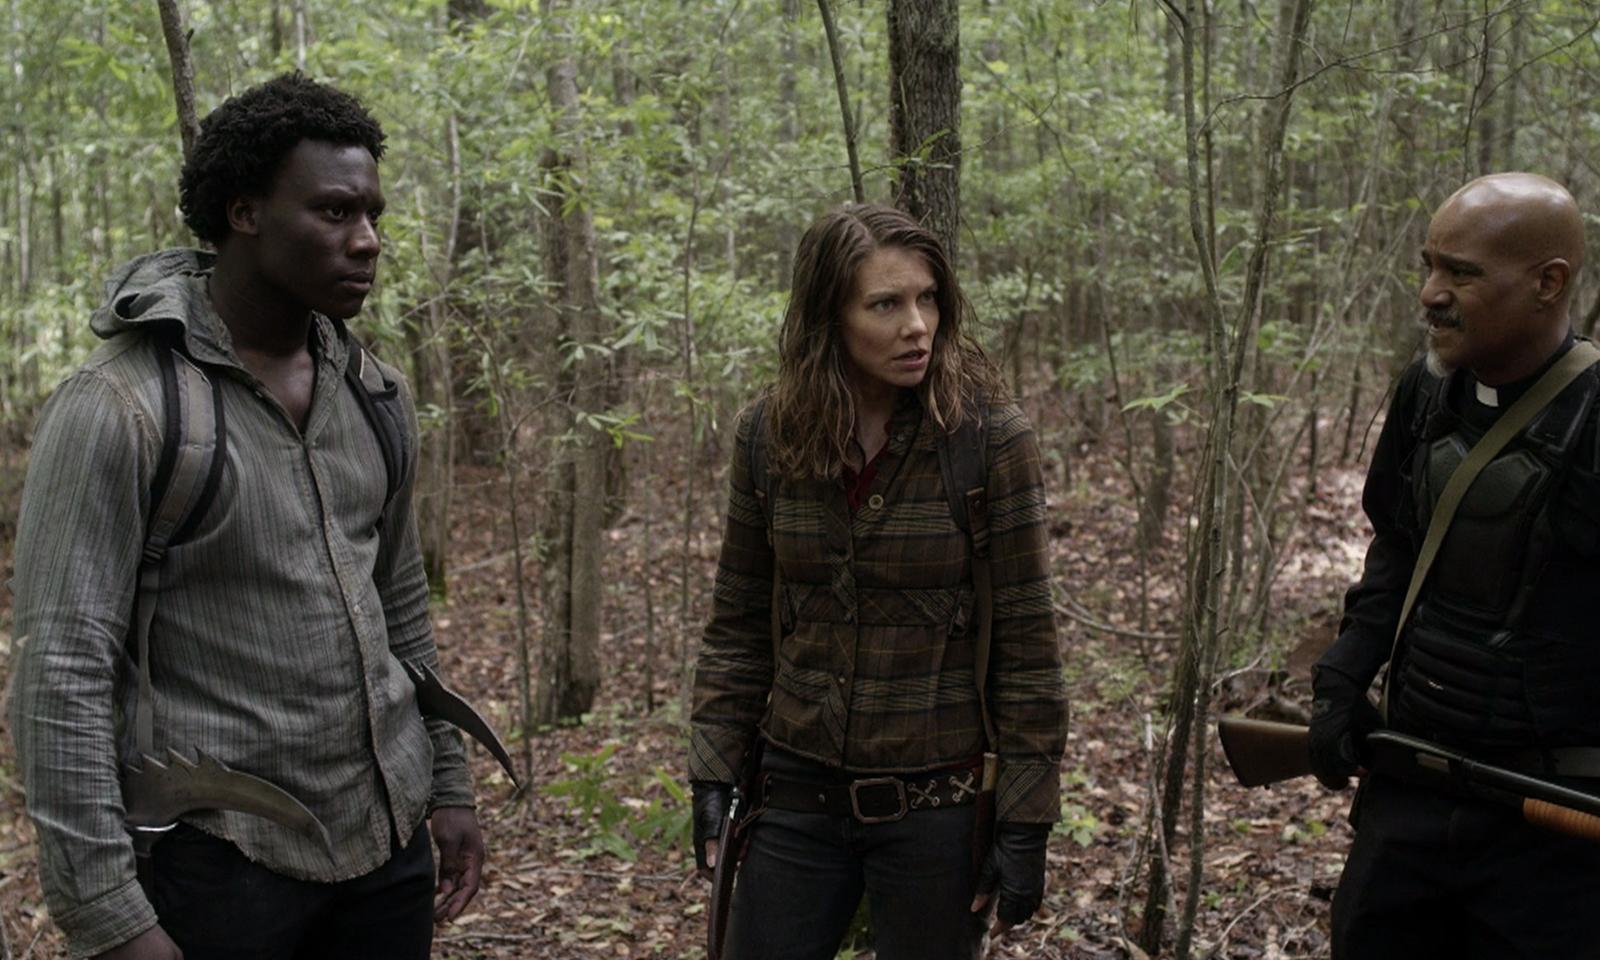 Elijah, Maggie e Gabriel na floresta no episódio 7 da 11ª temporada de The Walking Dead.